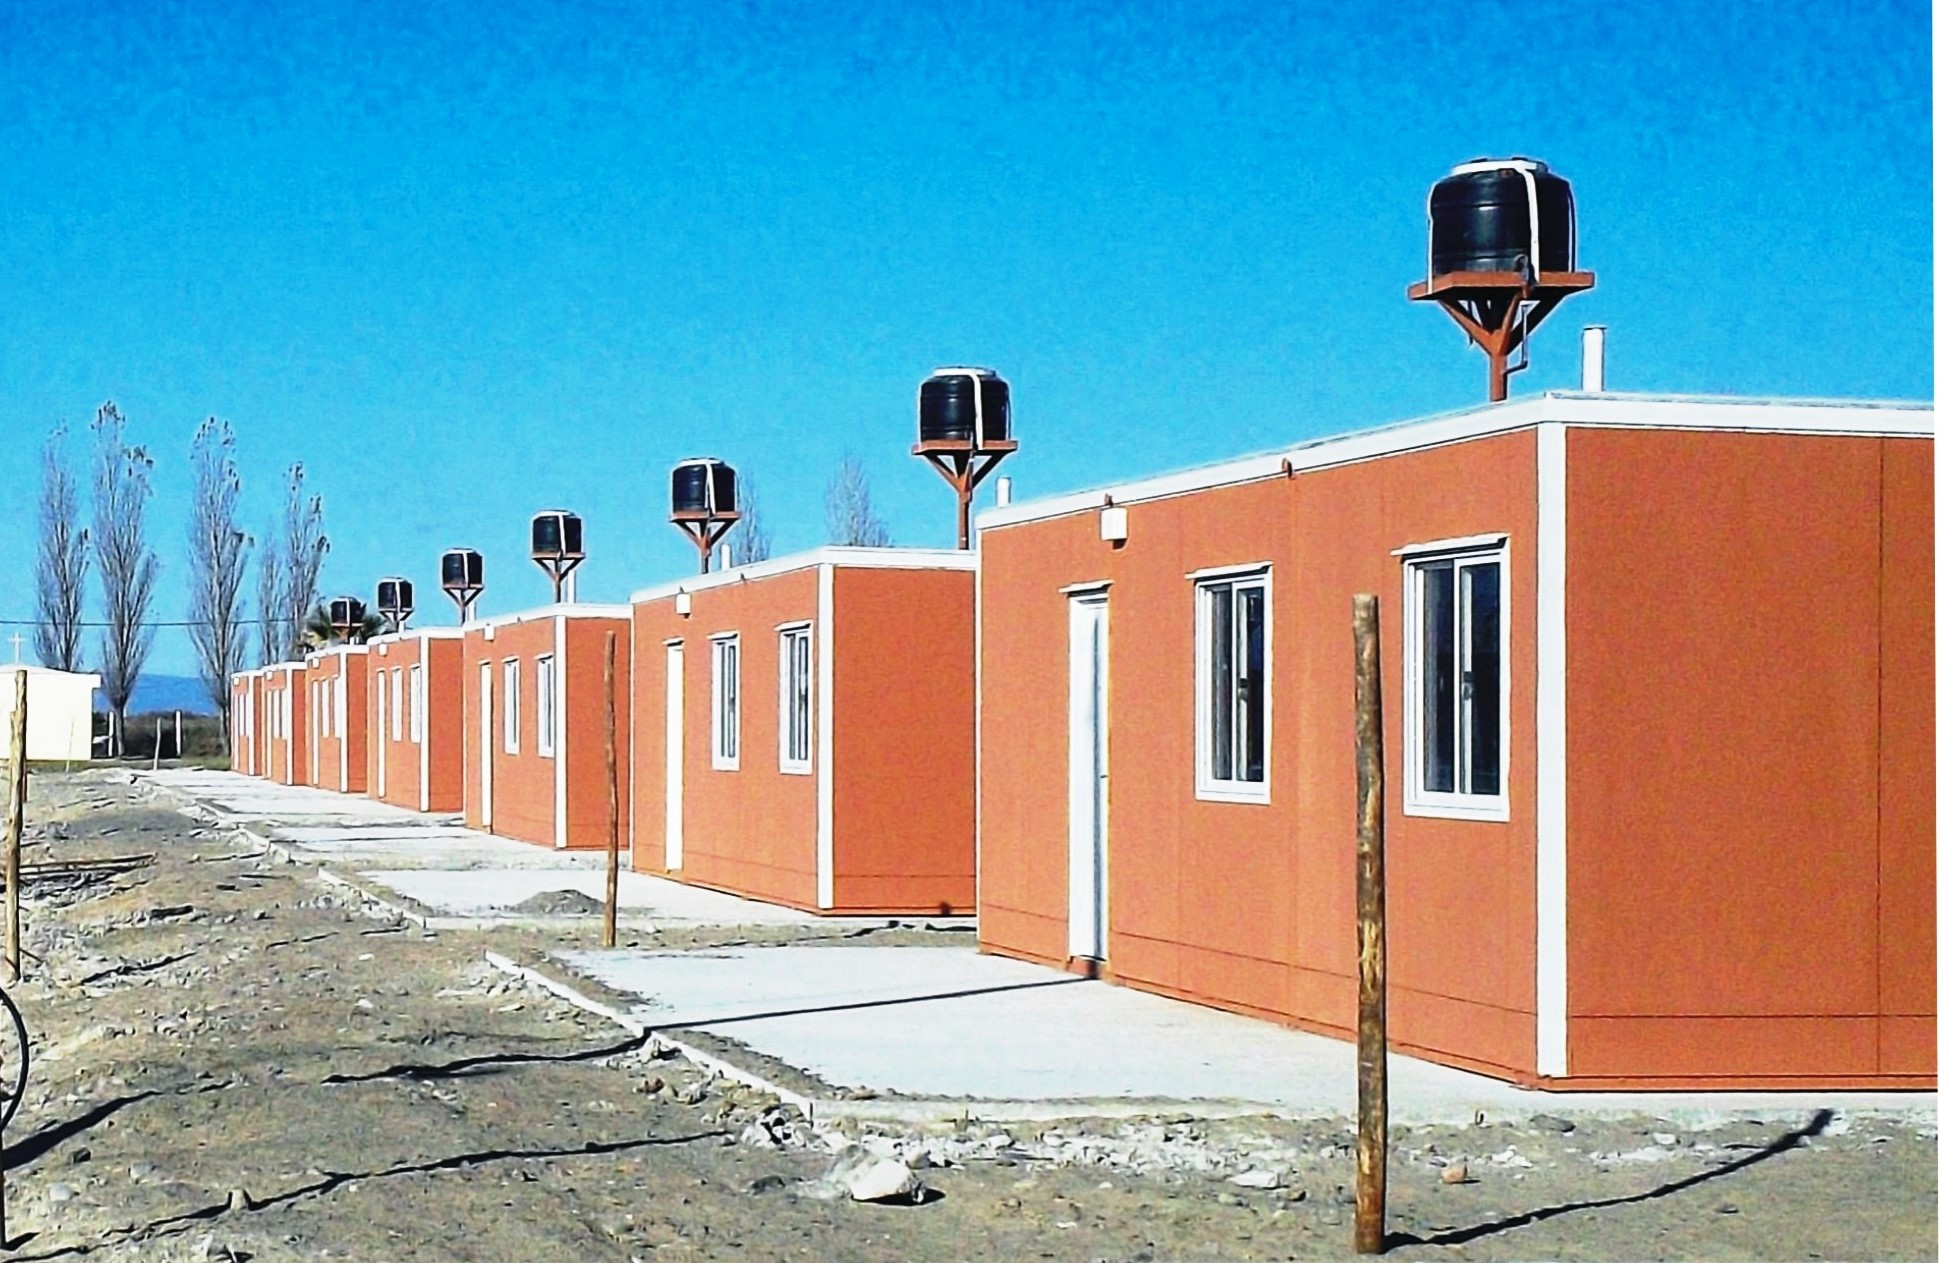 Construcción de 150 viviendas de emergencia, M de DH de San Juan